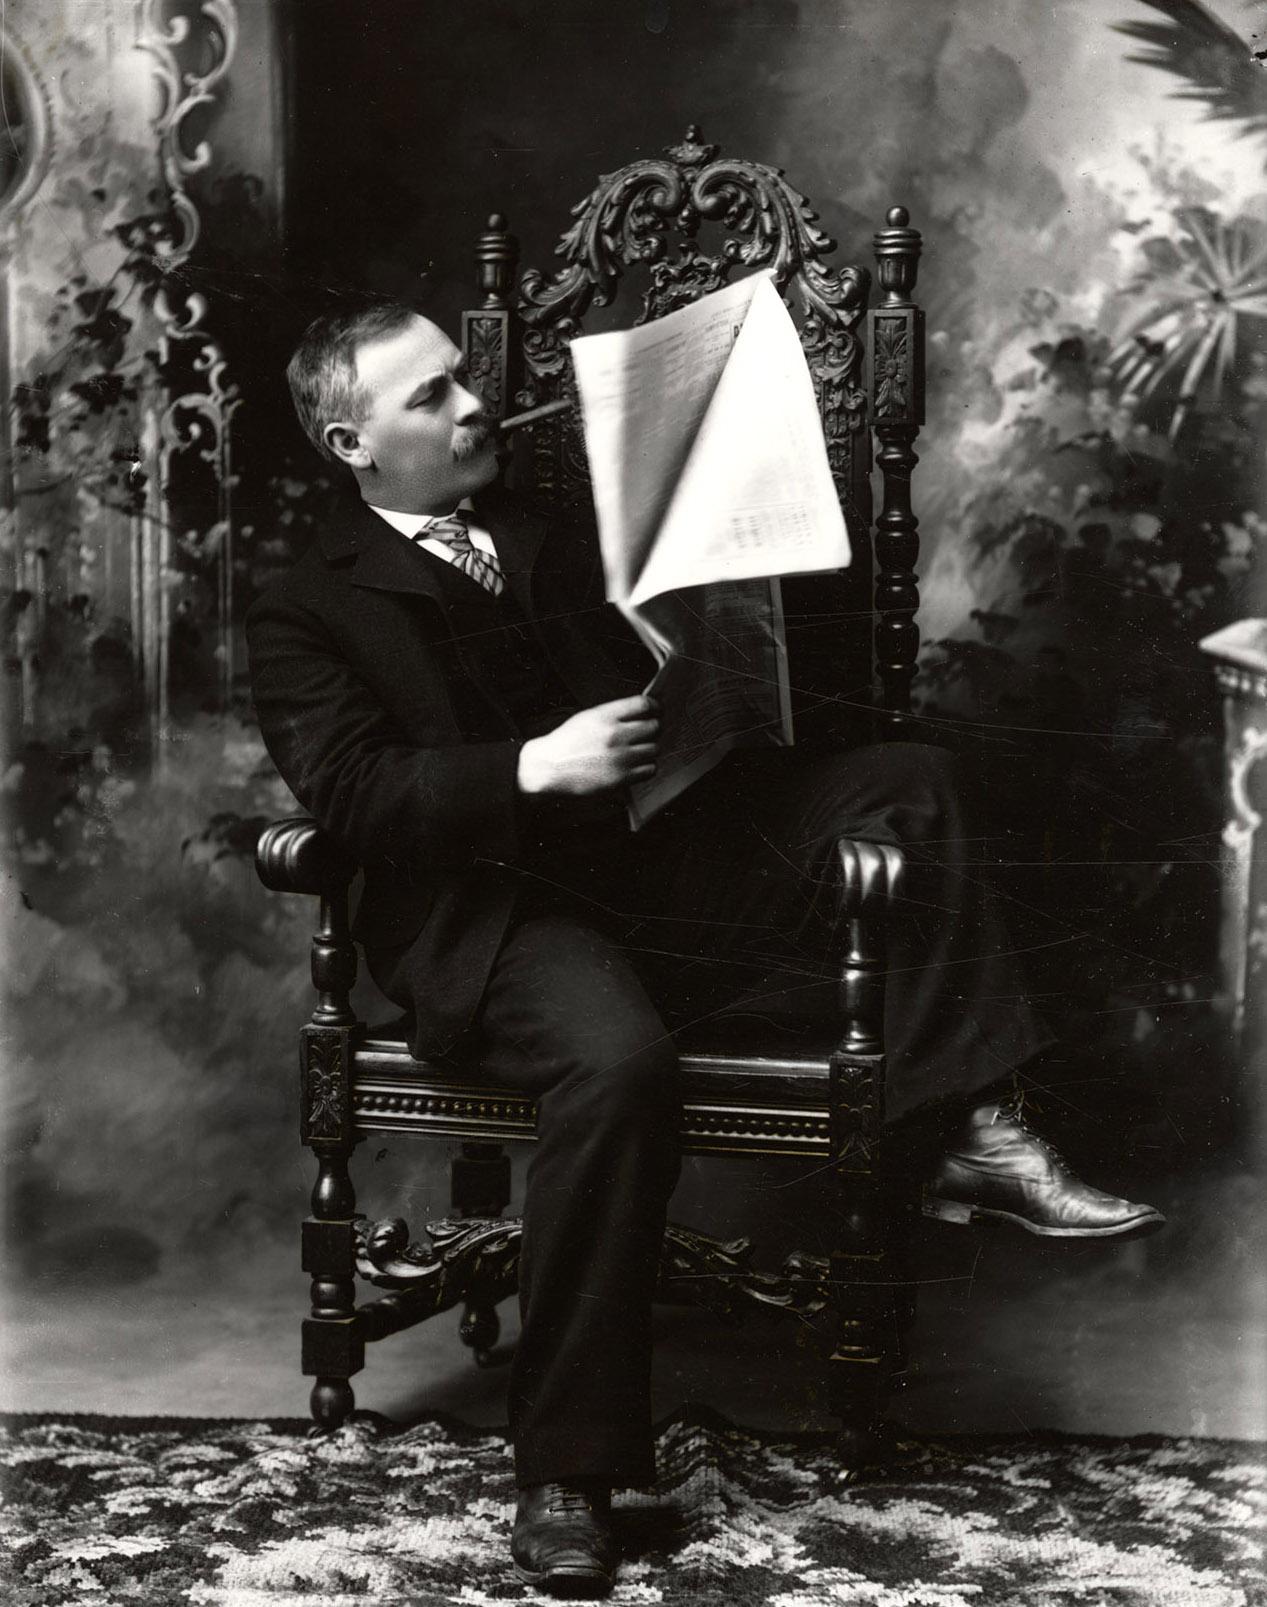 T.N. Barnard